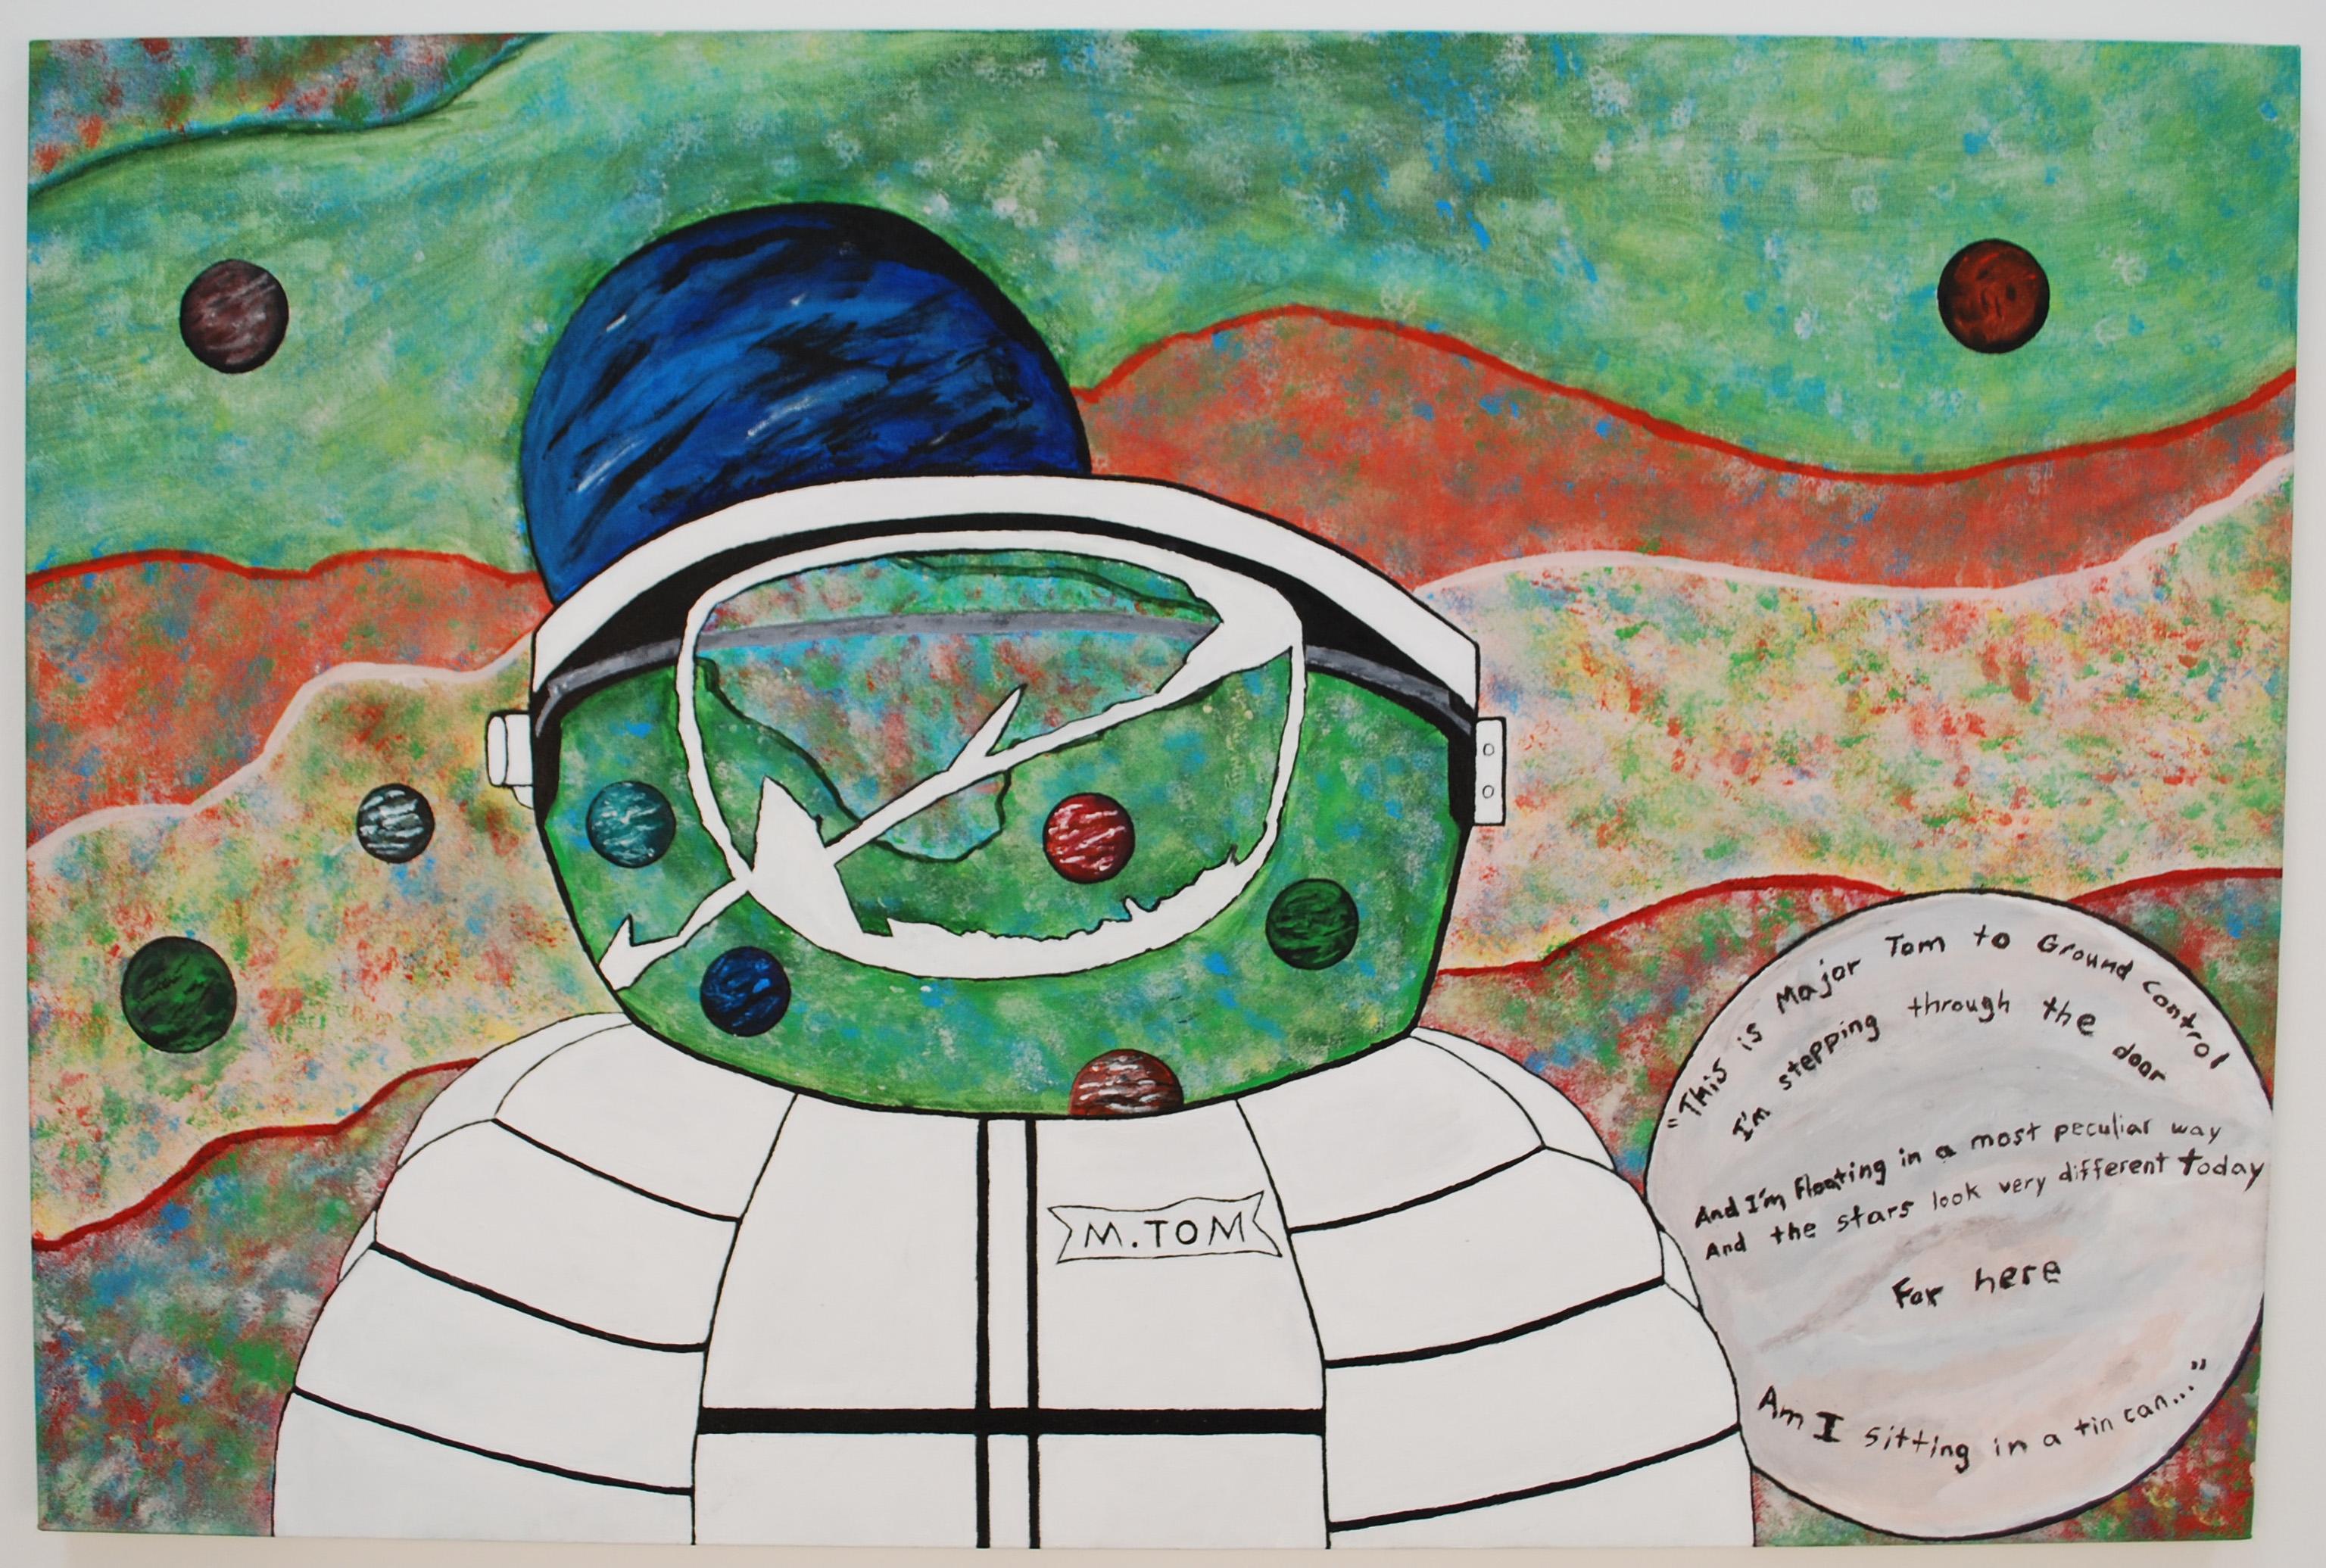 Space Oddity Major Tom artwork by Emilio Bravo - art listed for sale on Artplode